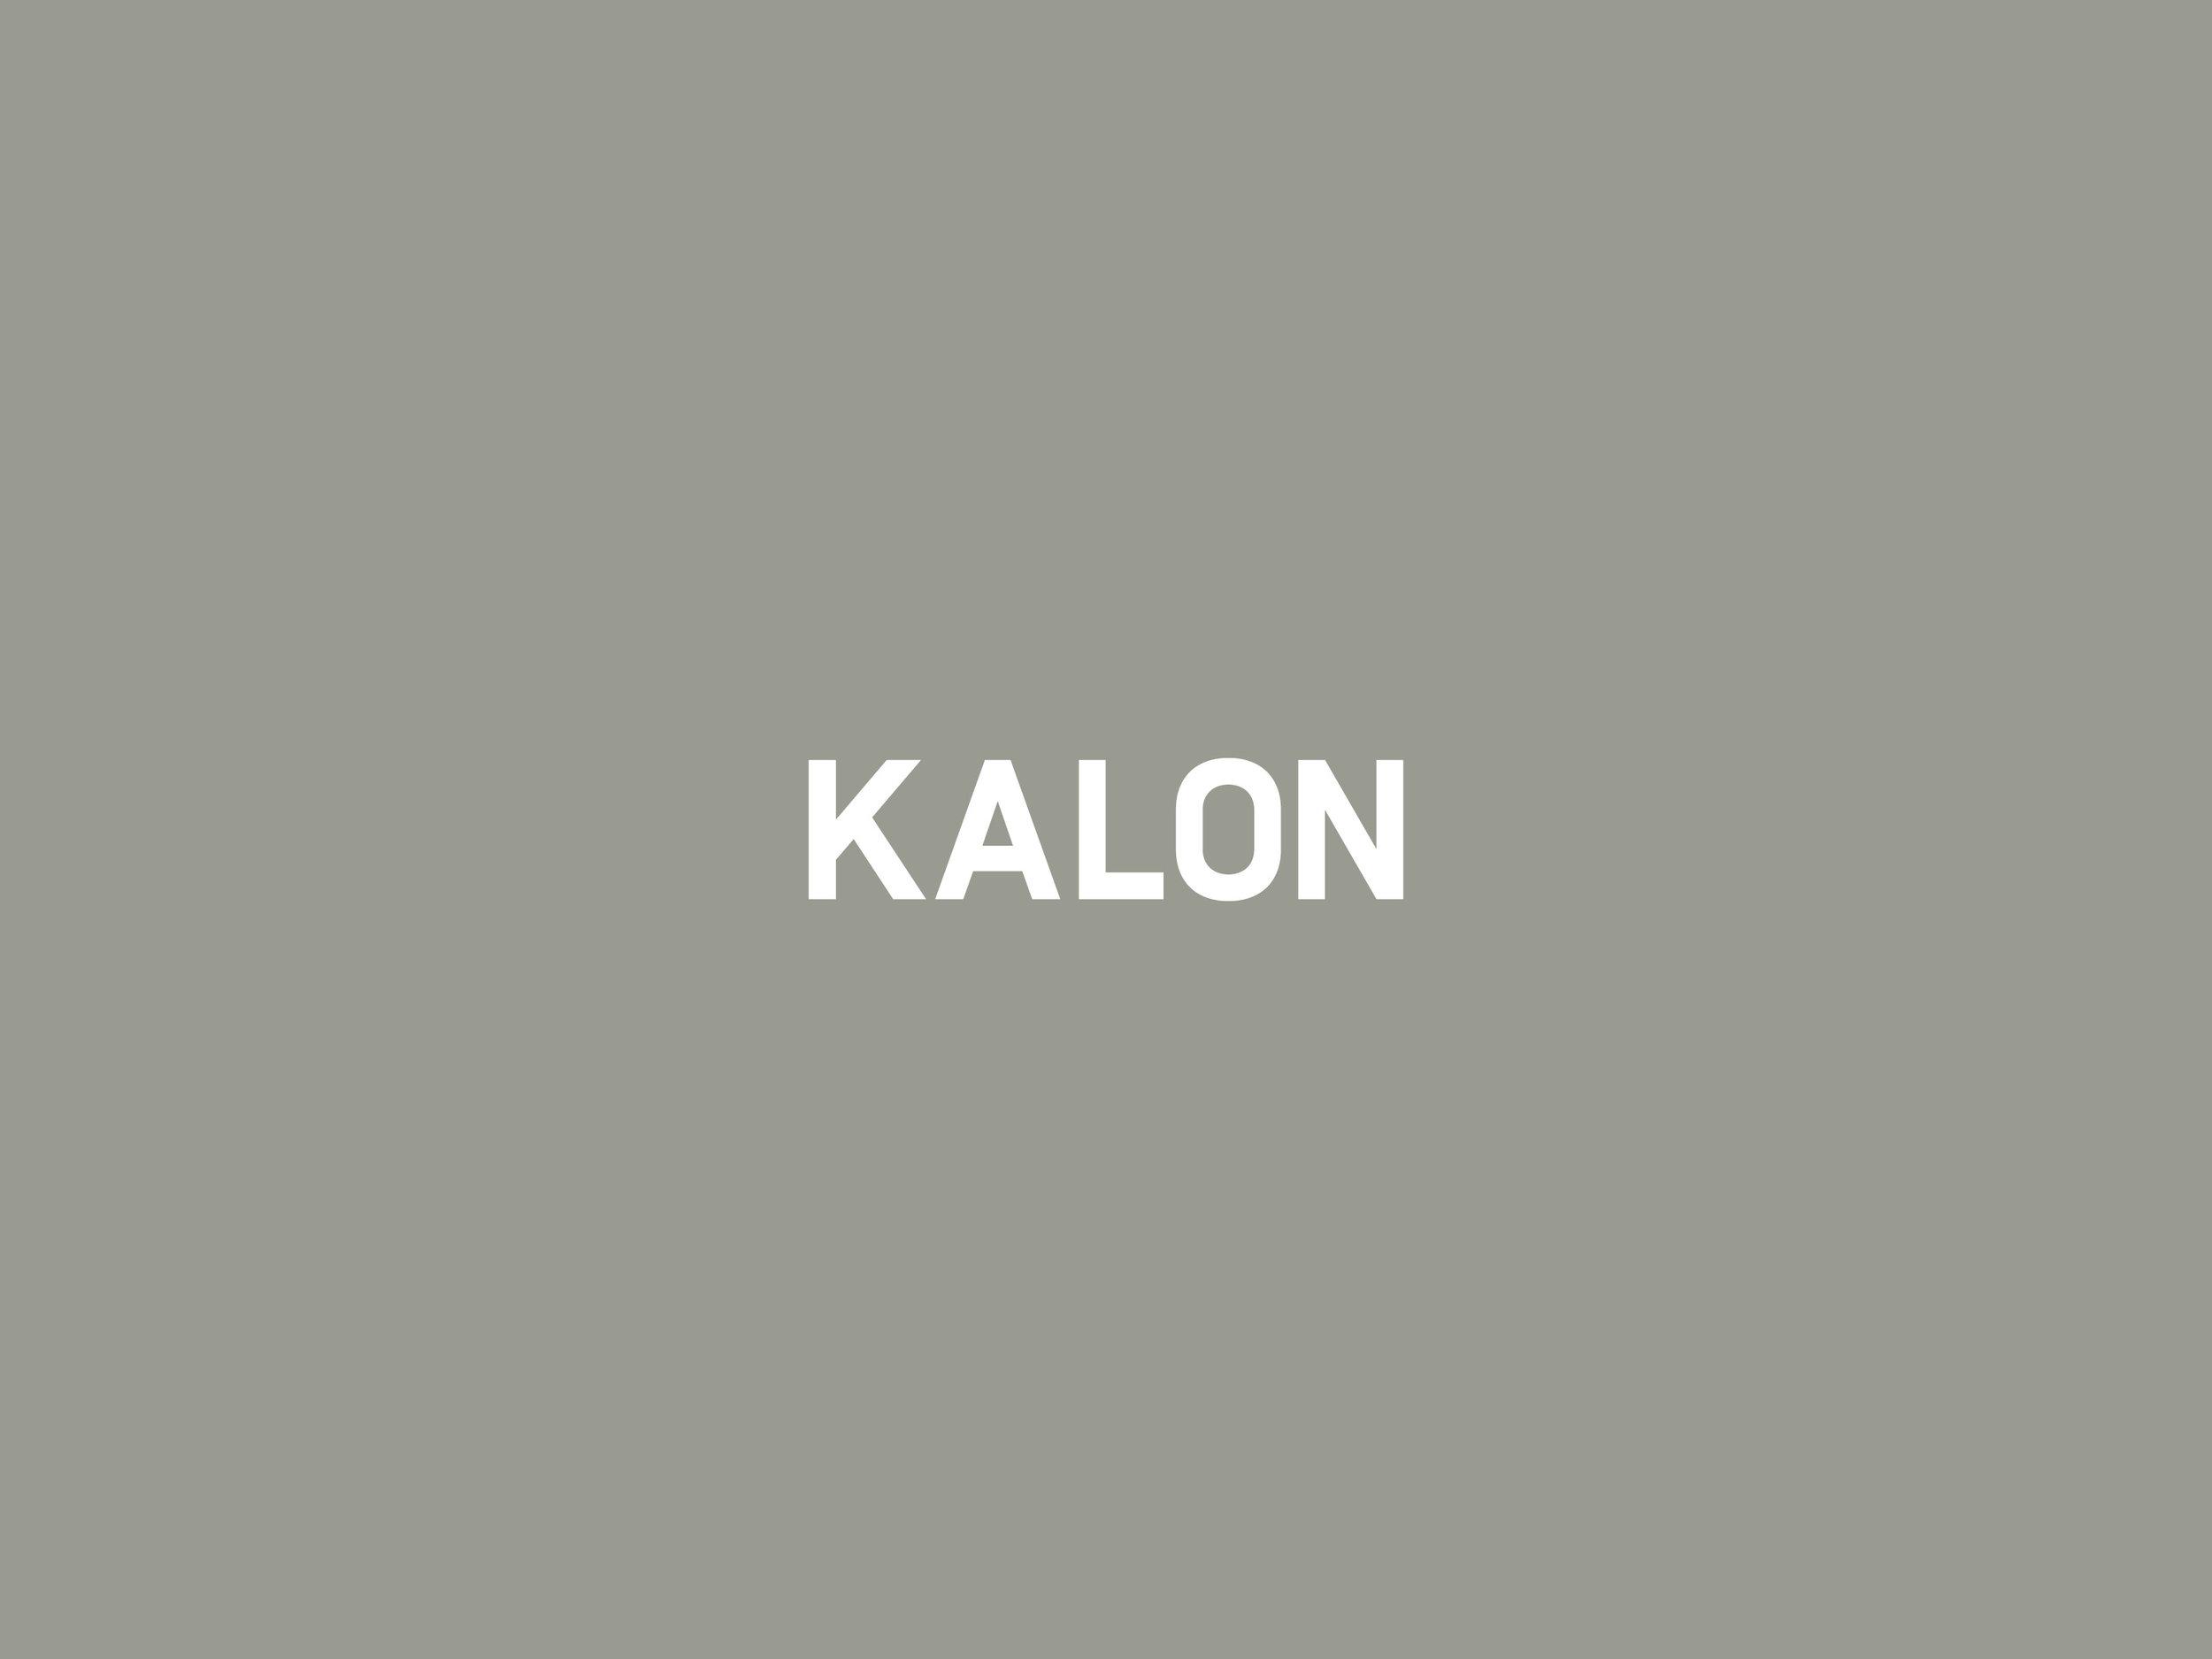 Kalon-Logo-Peggy-Chu.jpg